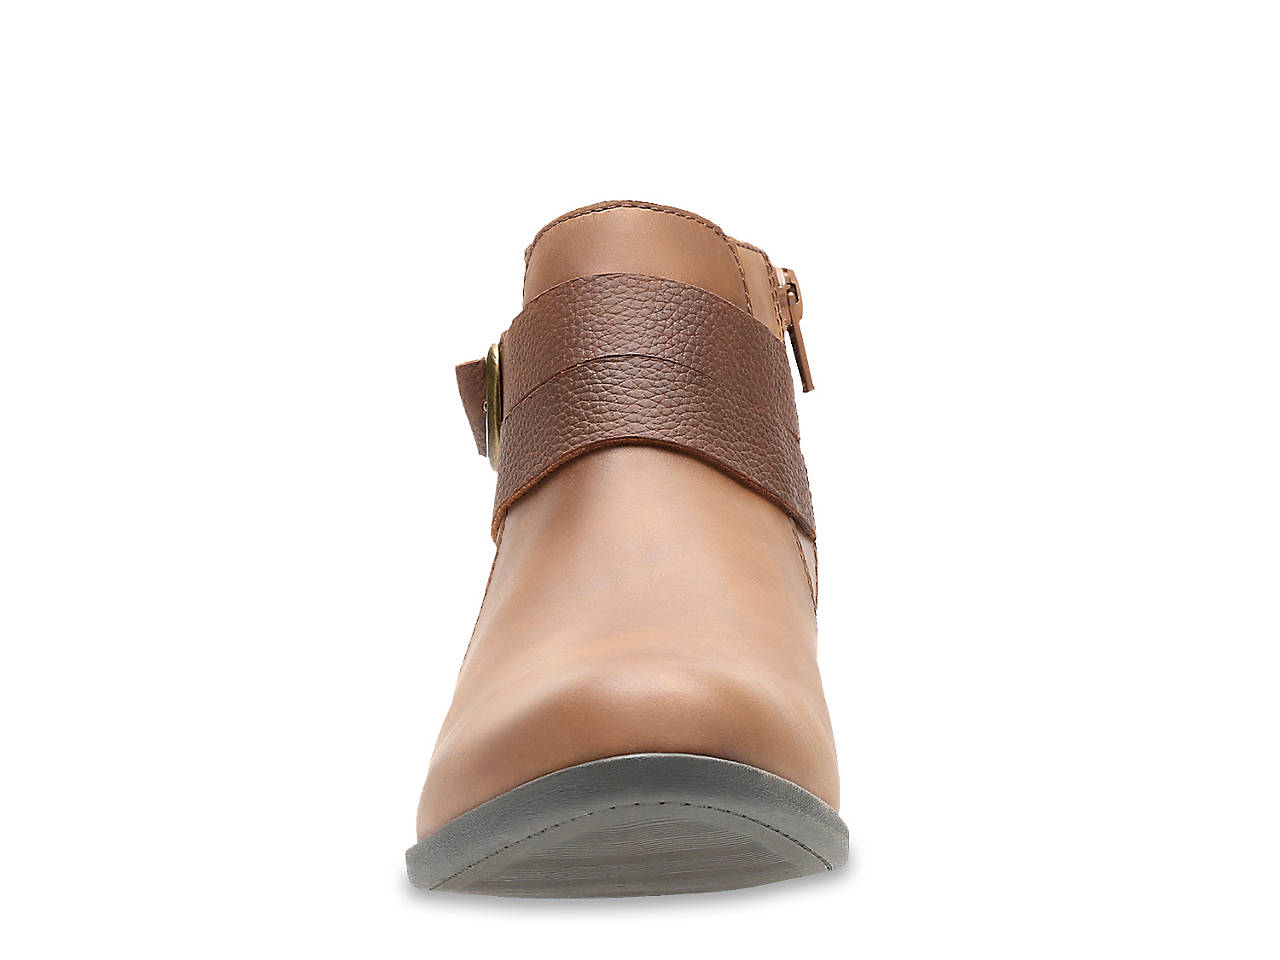 b0a6cfe03d0 Clarks Addiy Cora Bootie Women s Shoes